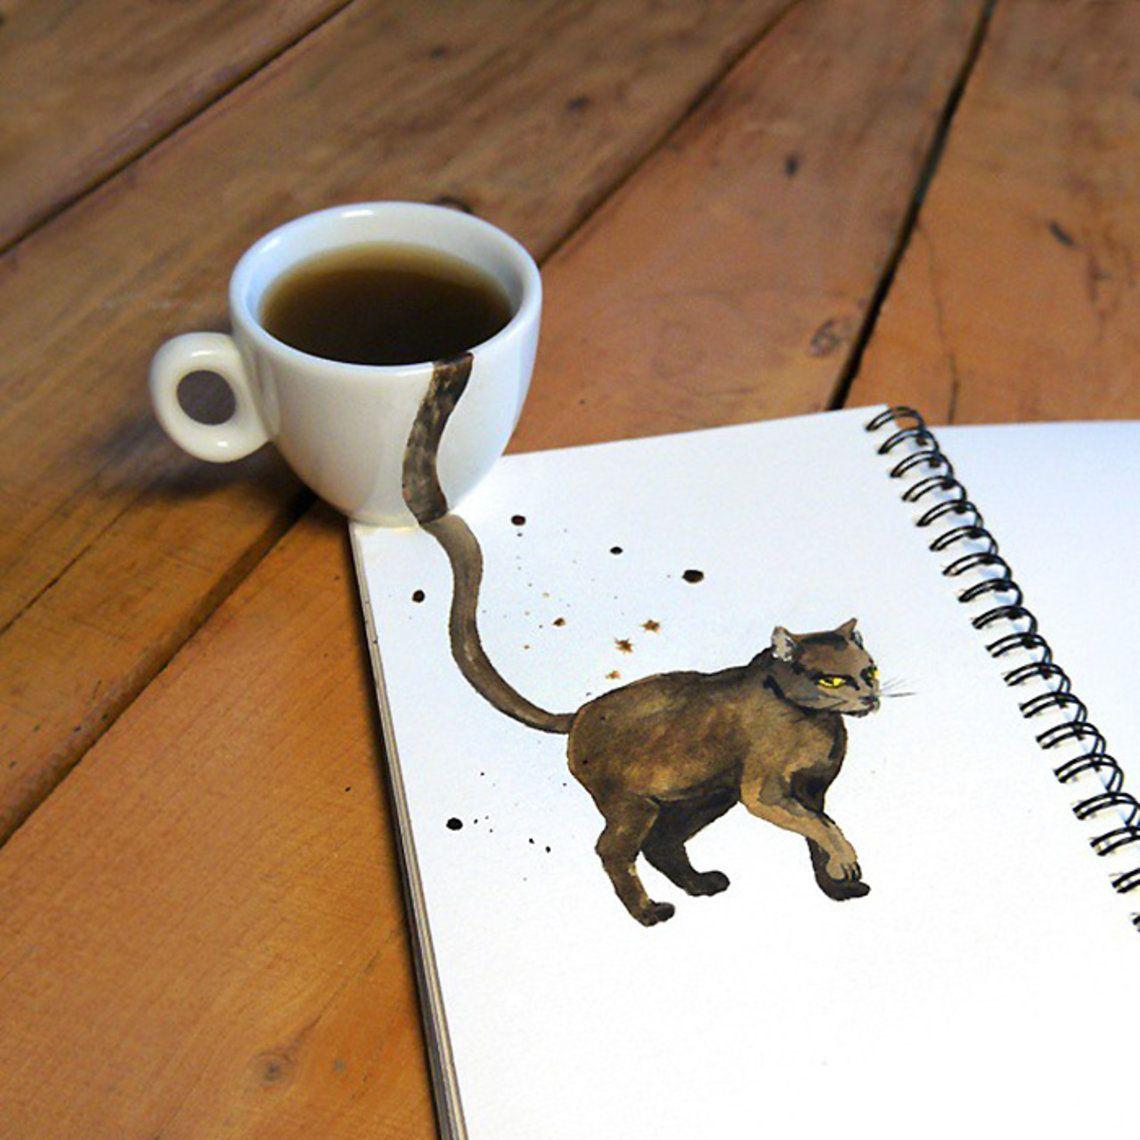 Katze Trinkt Kaffee